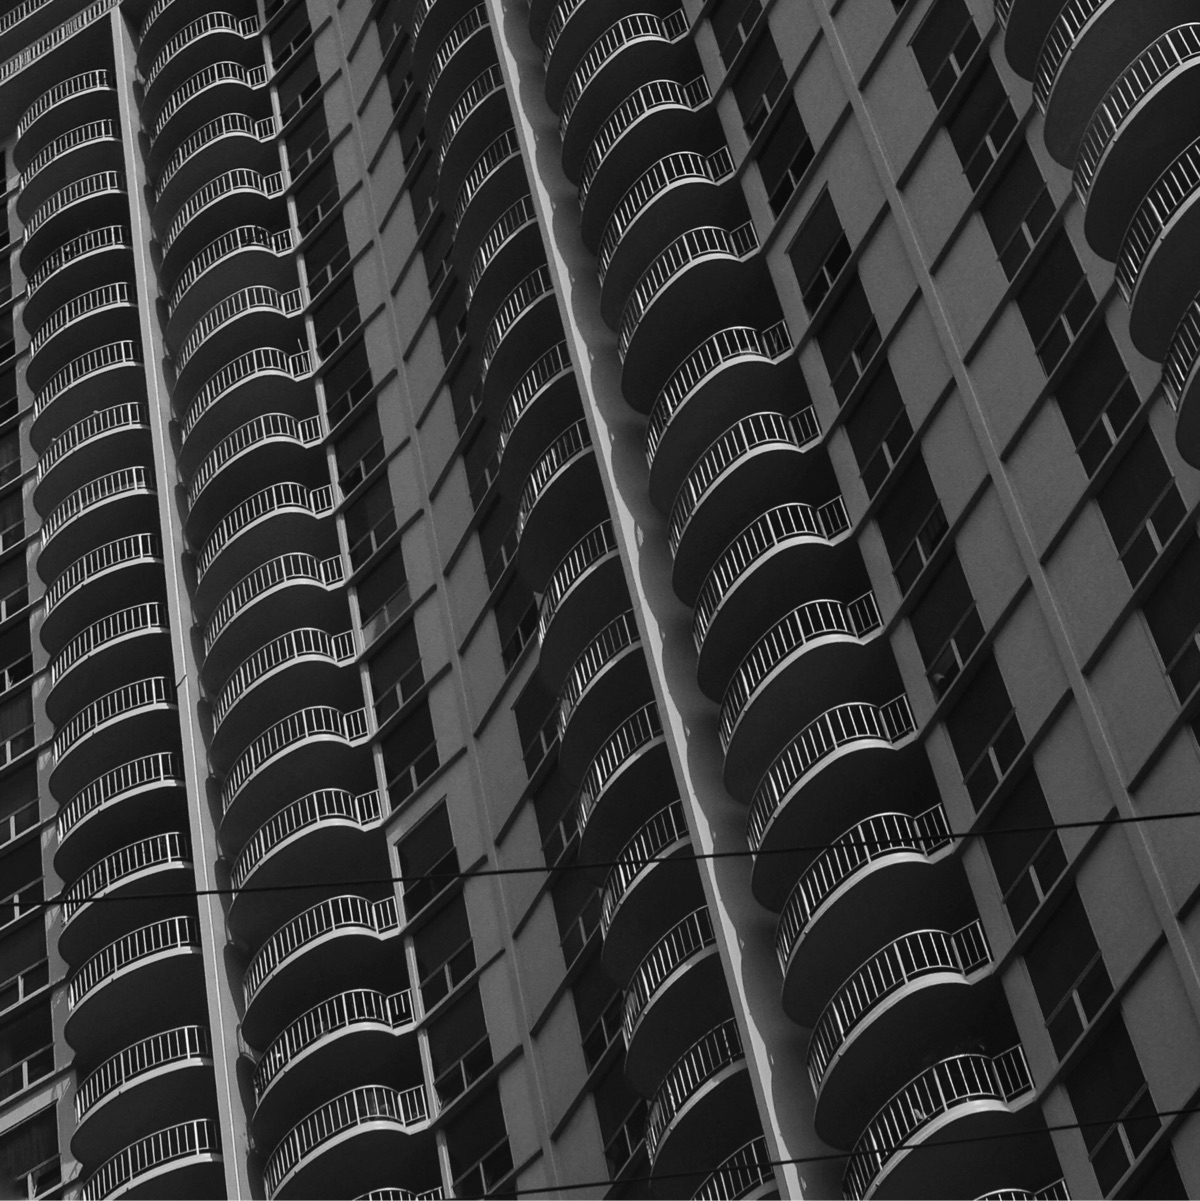 Building lines - pixnix | ello